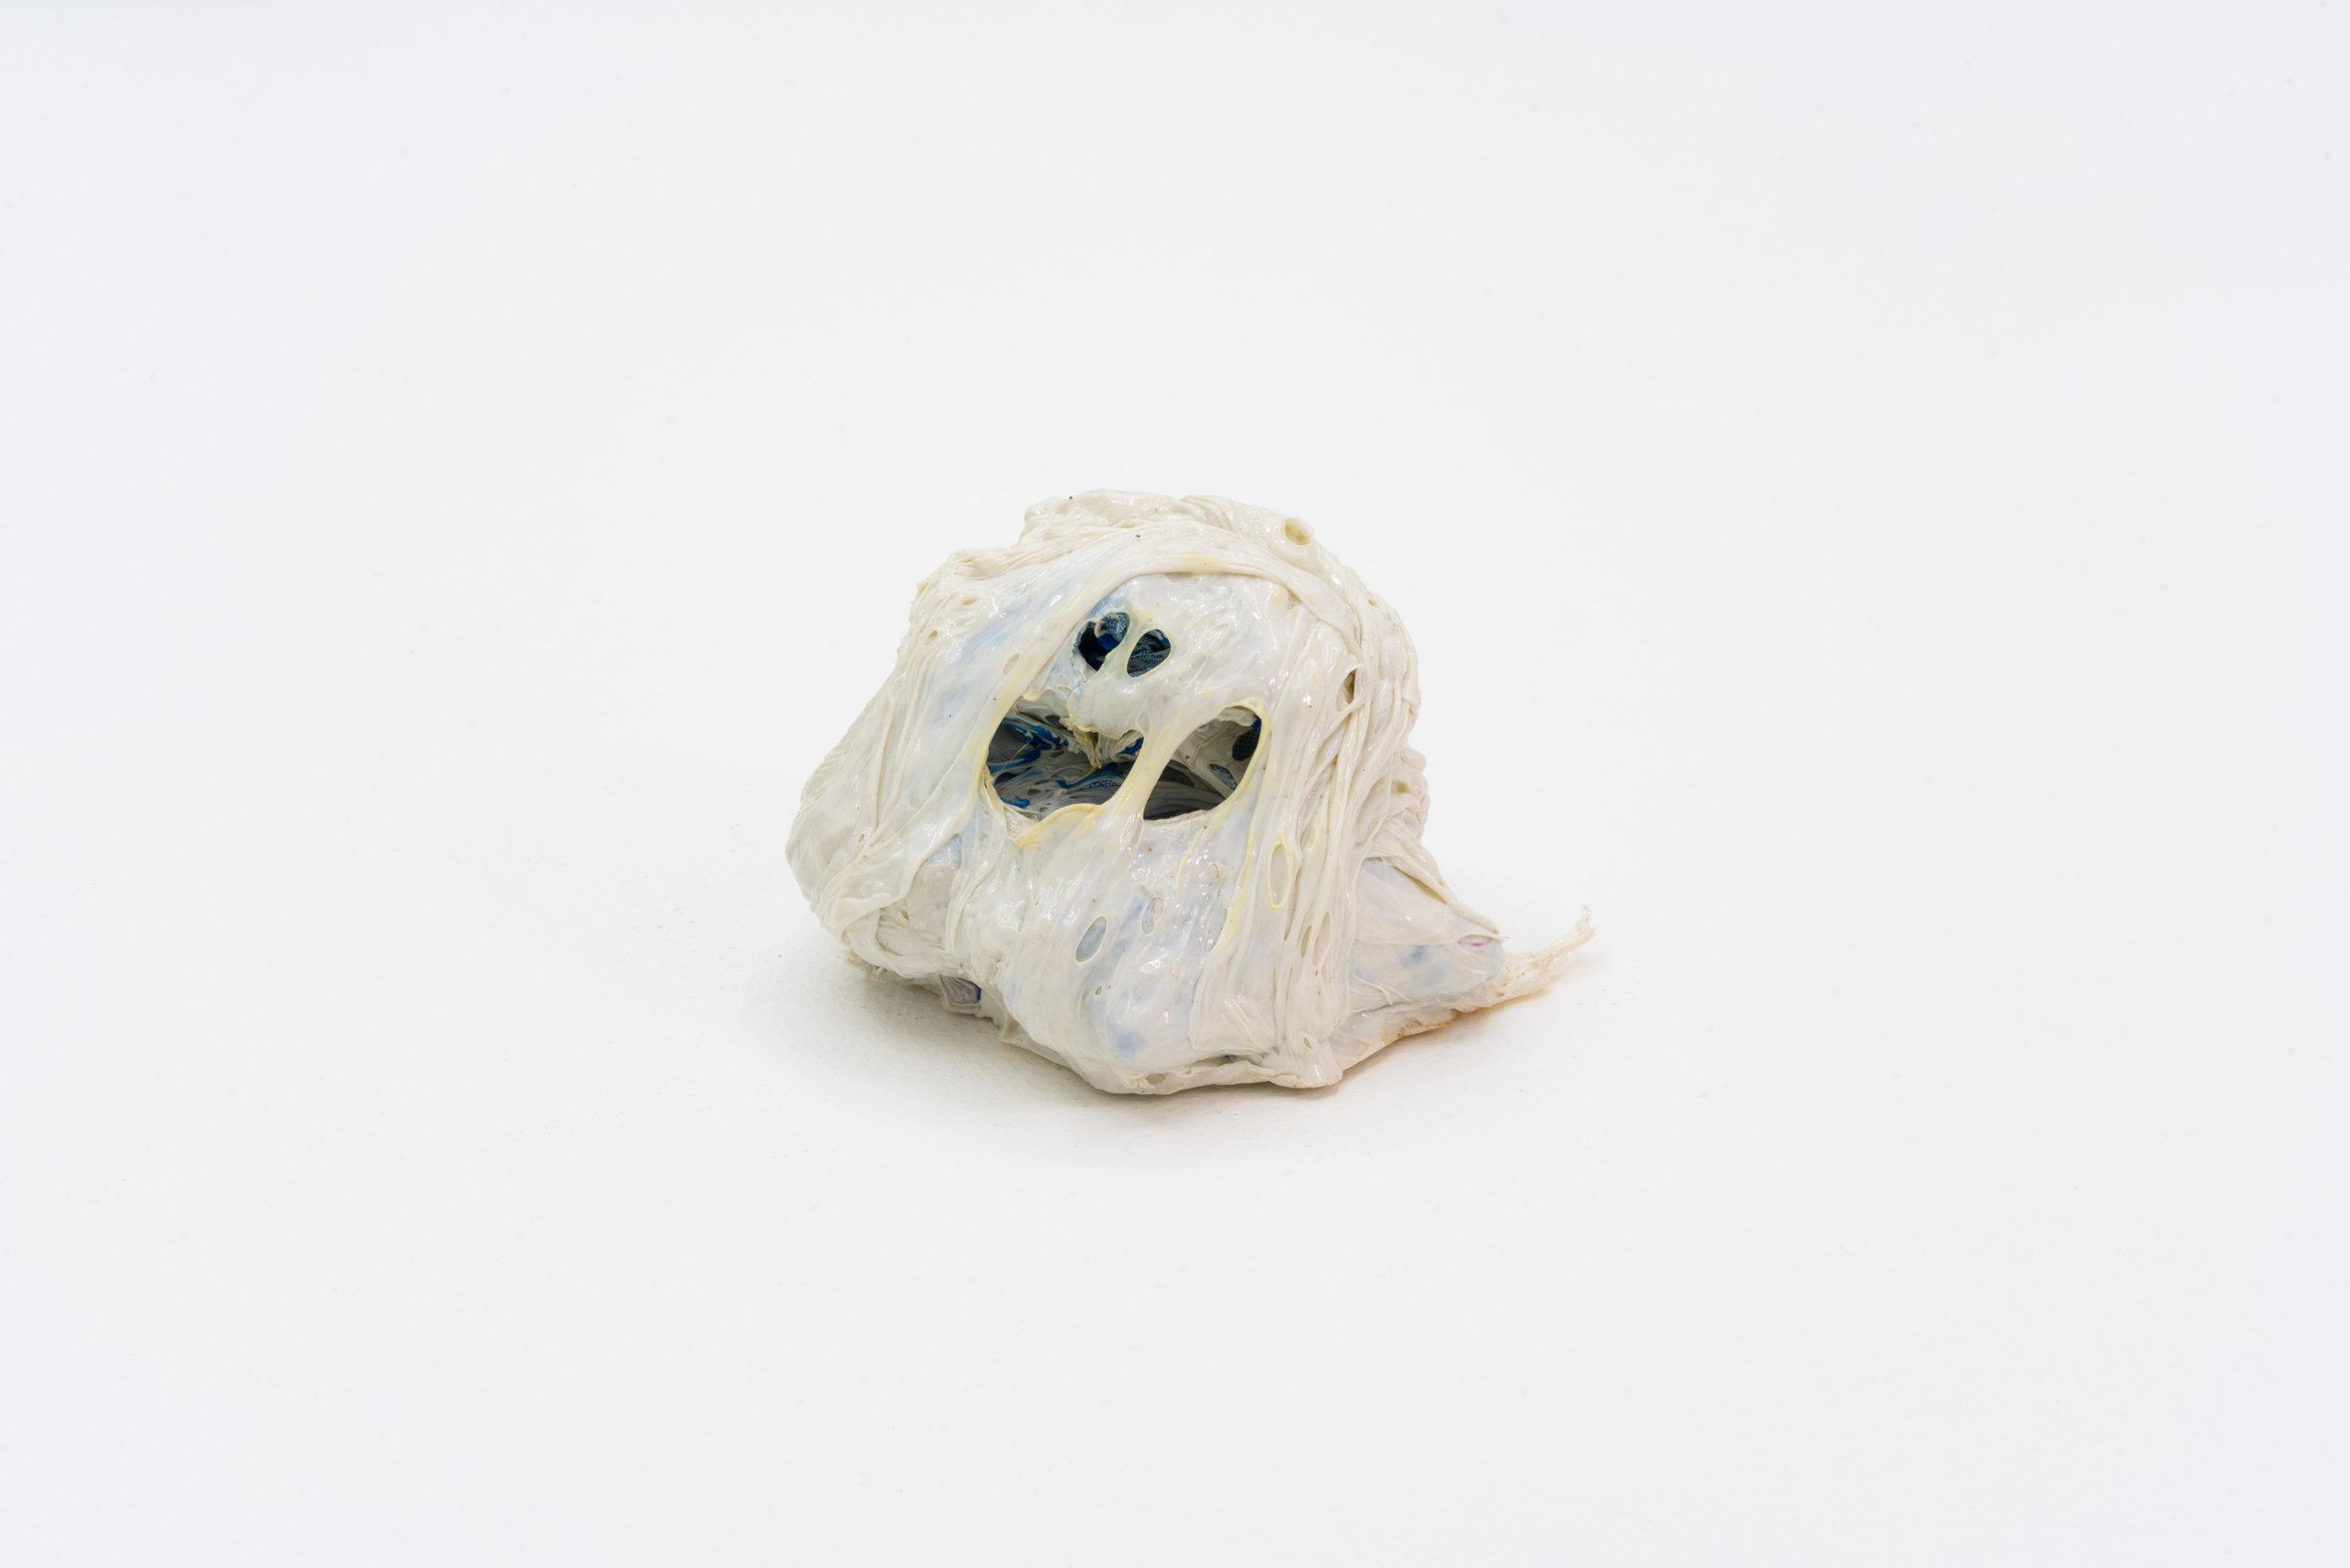 Remko Scha,  Plastic Meltdown , 1962-1992, Plastic, 6 x 10 x 8 cm